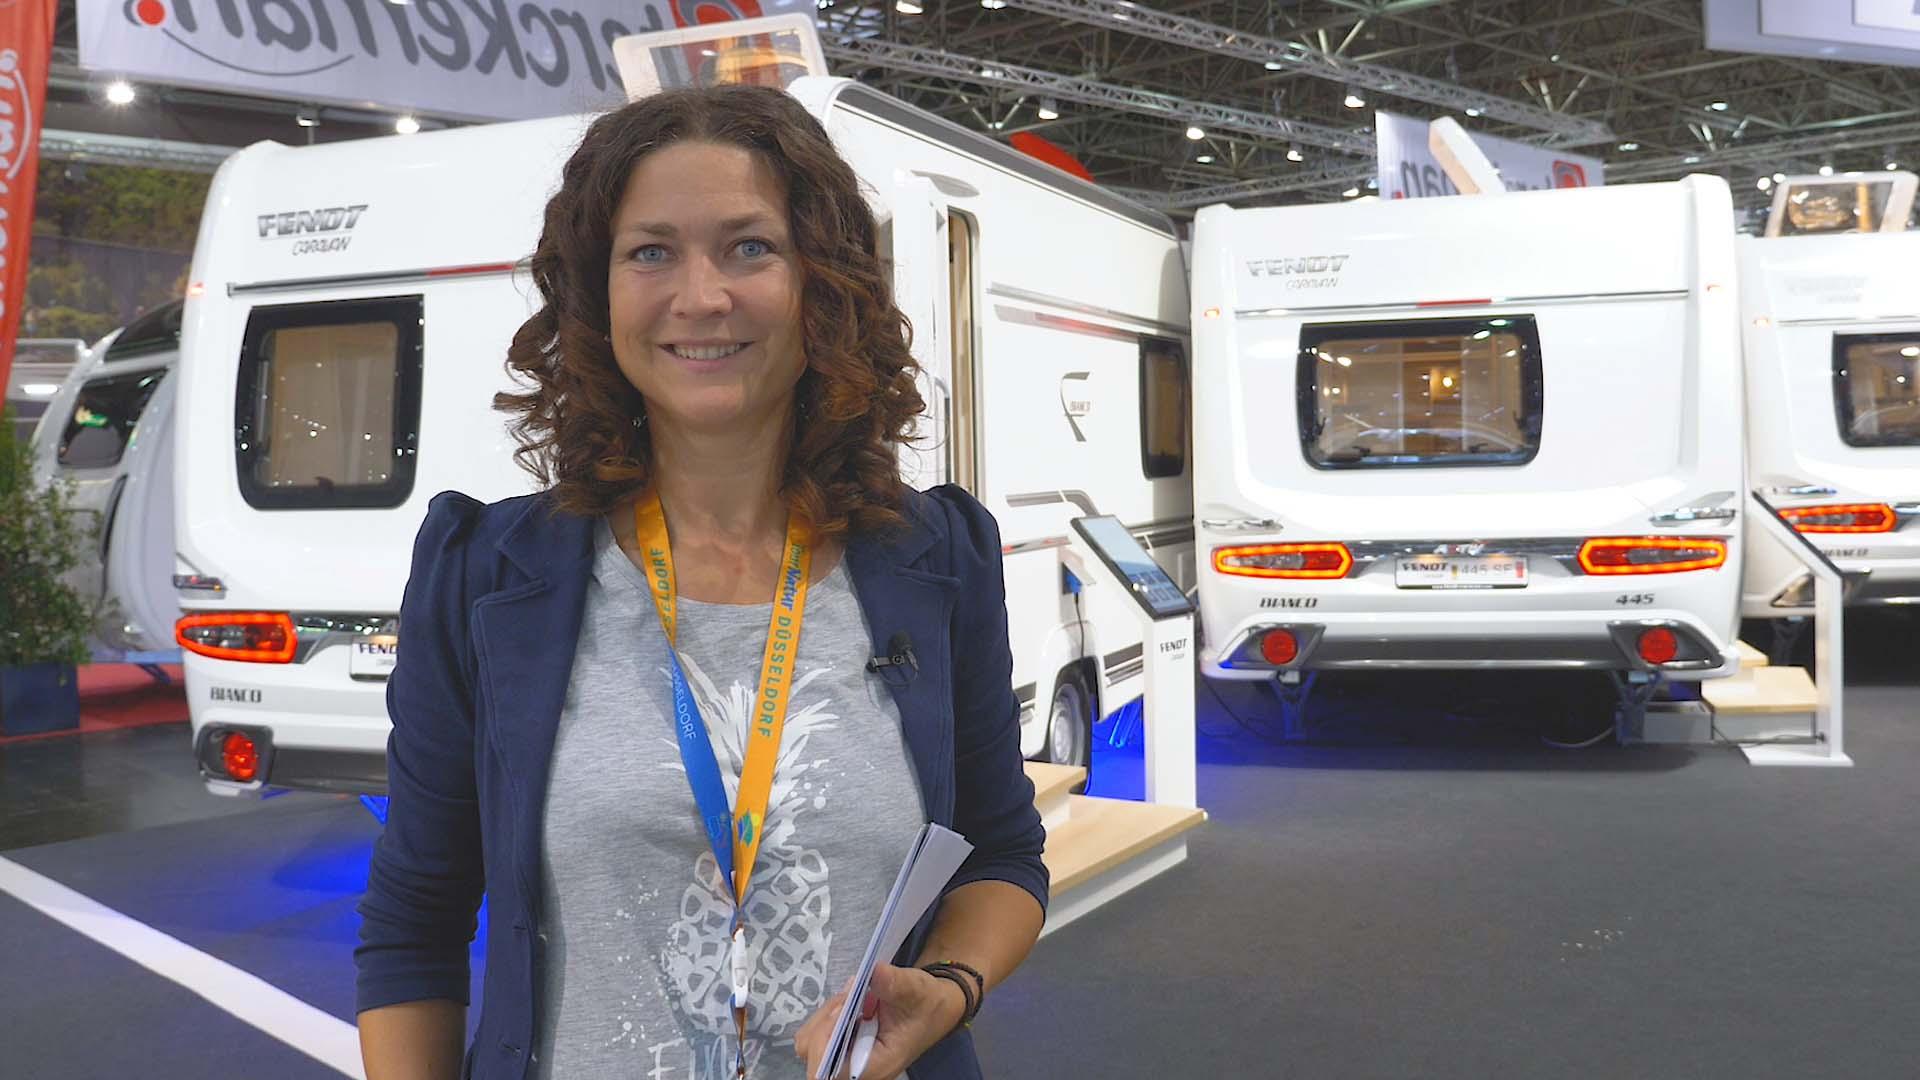 Video-Roomtour: Fendt Bianco Activ 390 FHS – Kompakter Reise-Caravan für Vielesser